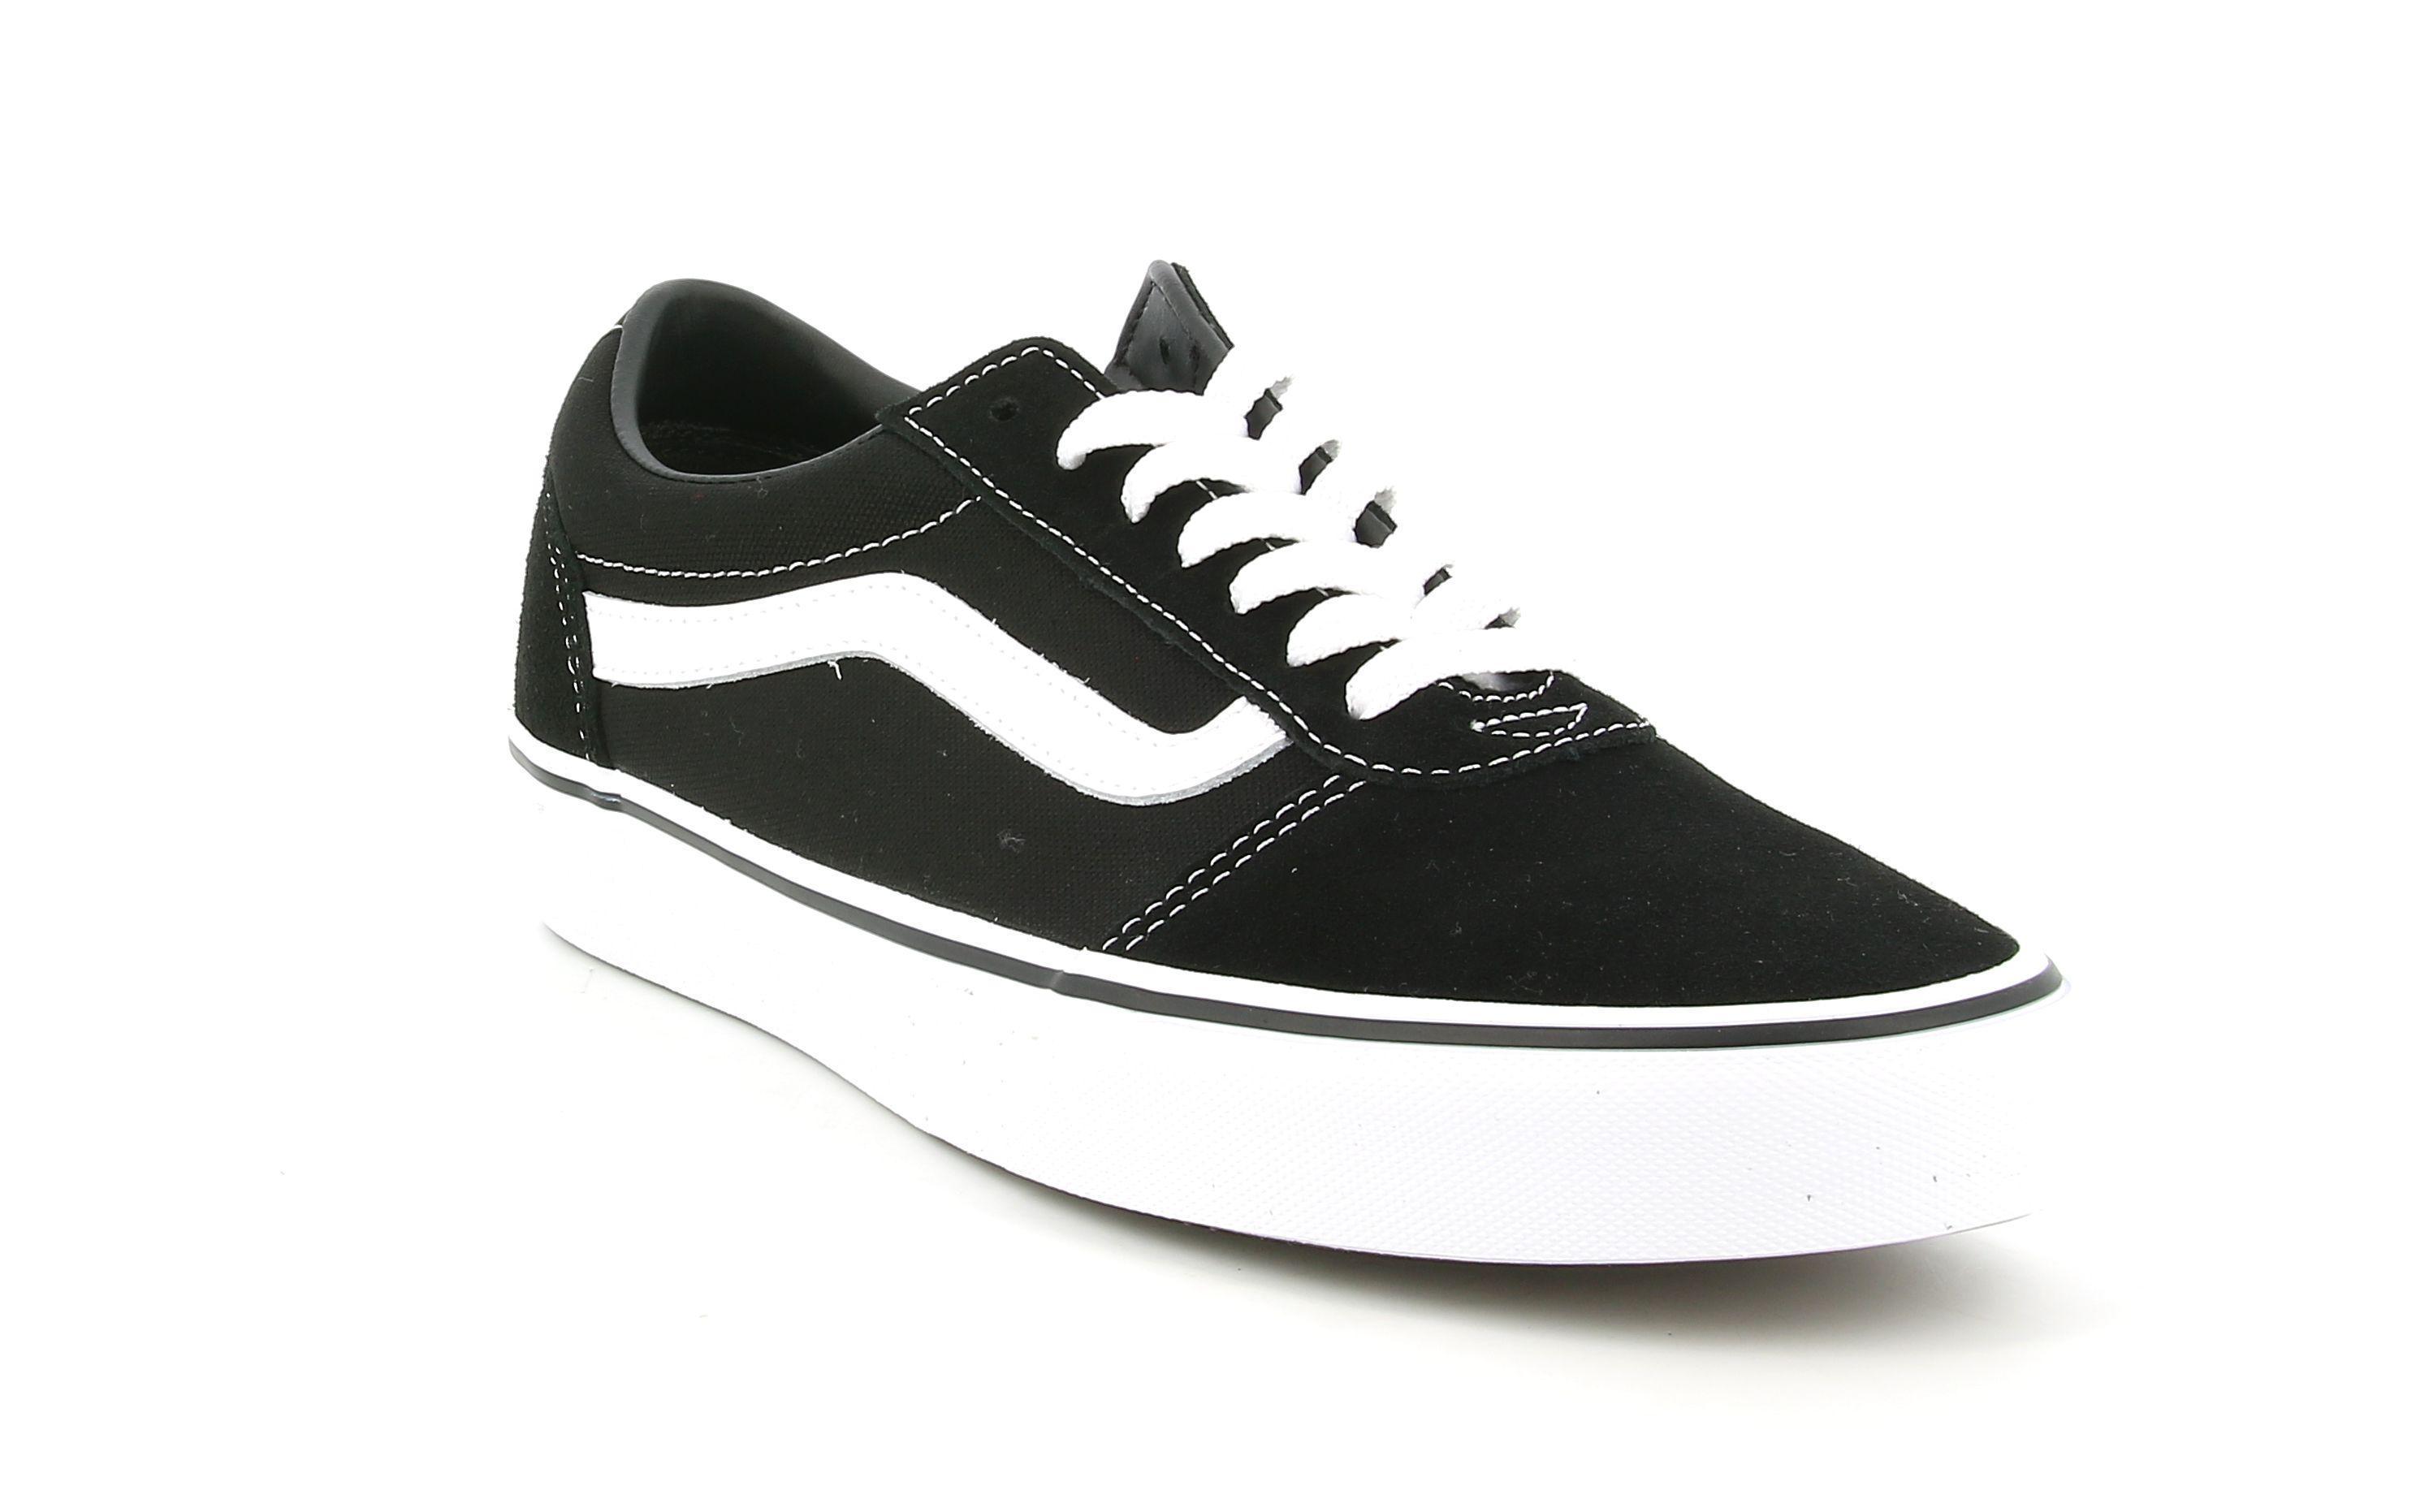 vans vans sneakers uomo  vn0a36emc4r1 nero bianco